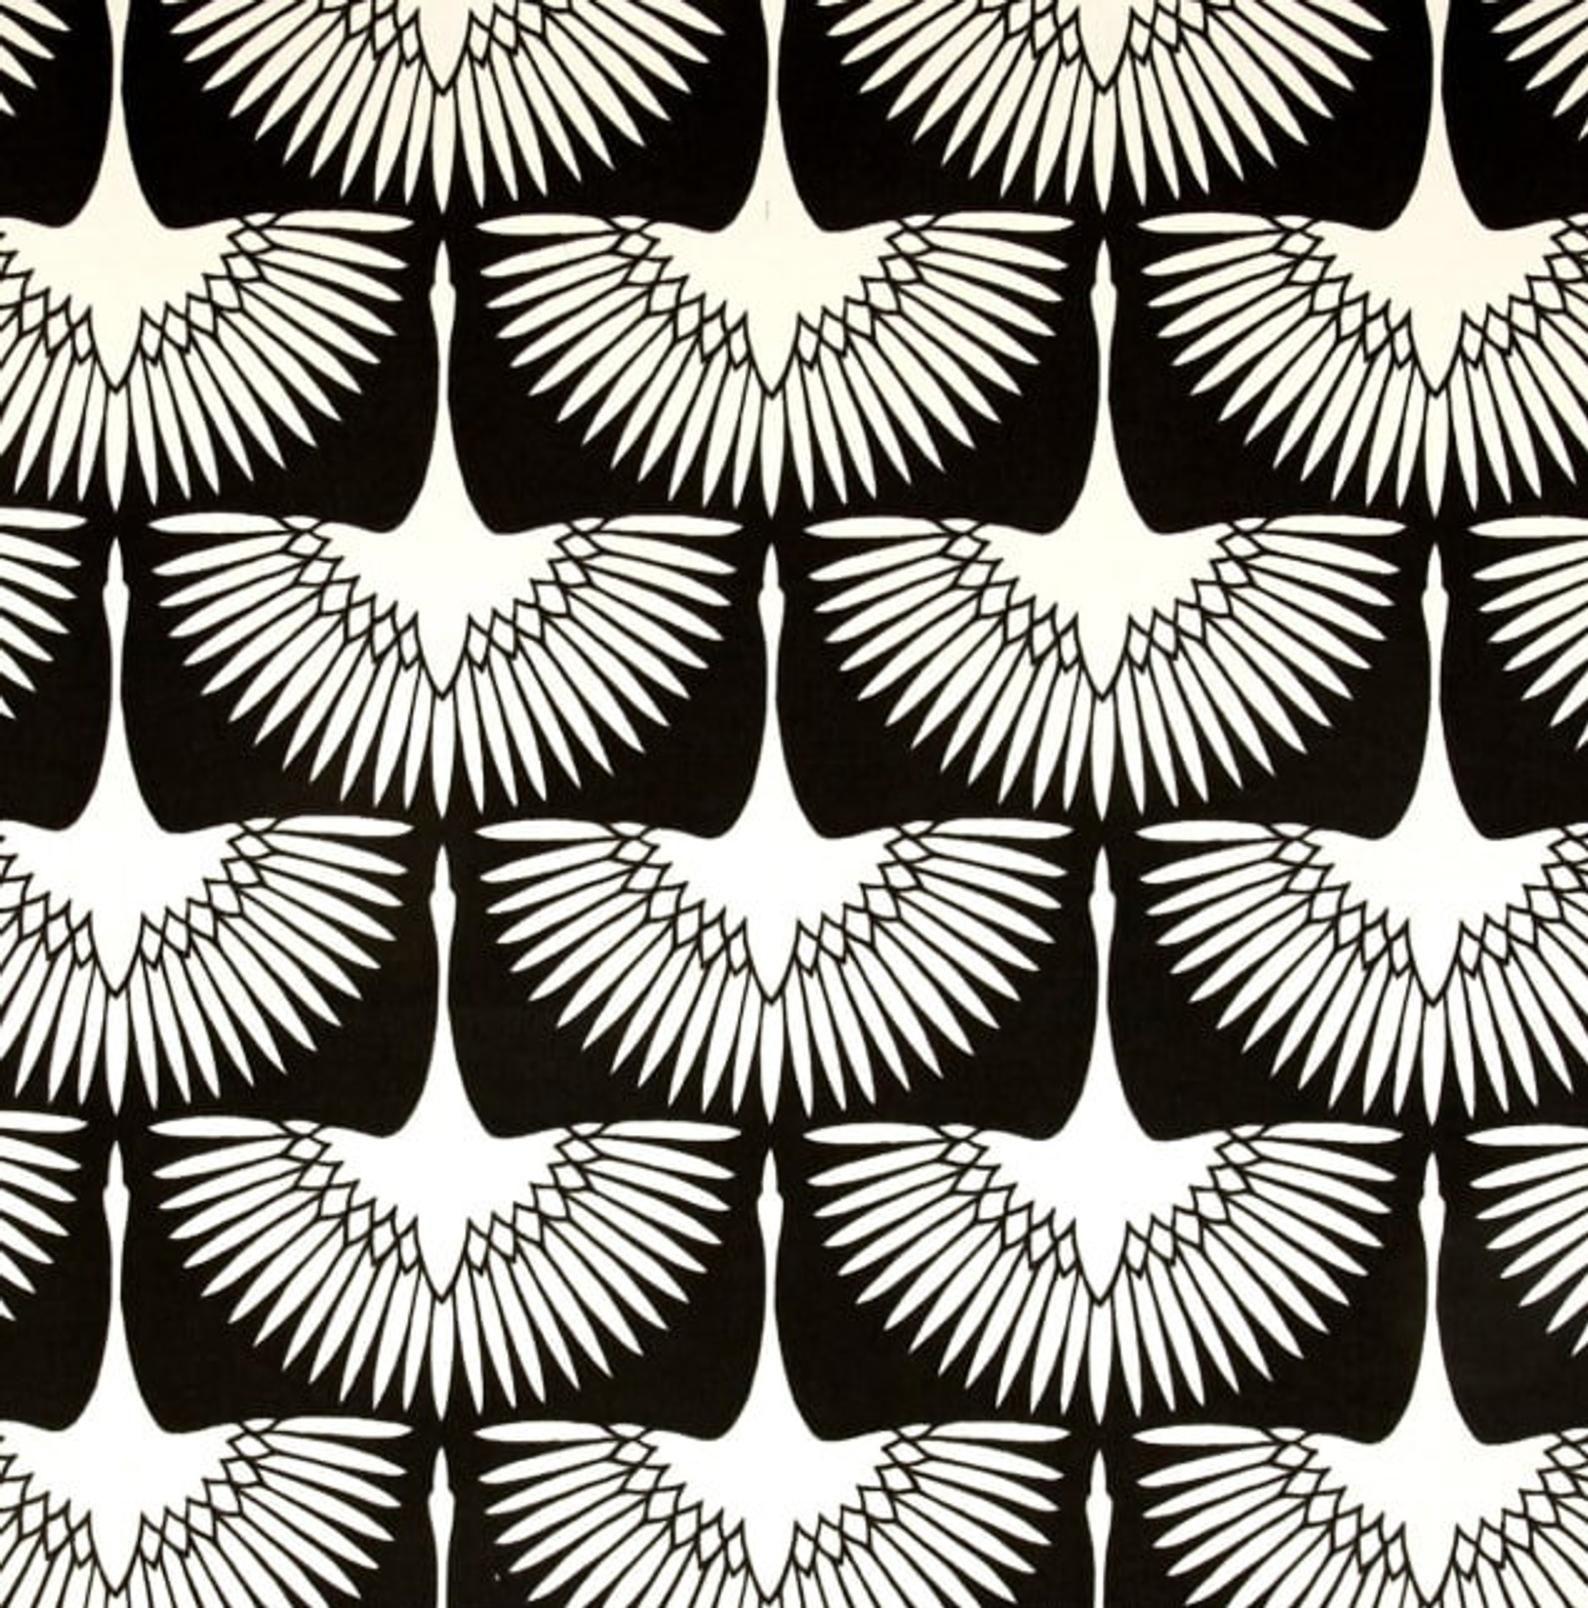 Genevieve Gorder Flock Midnight Outdoor Fabric Crane Outdoor